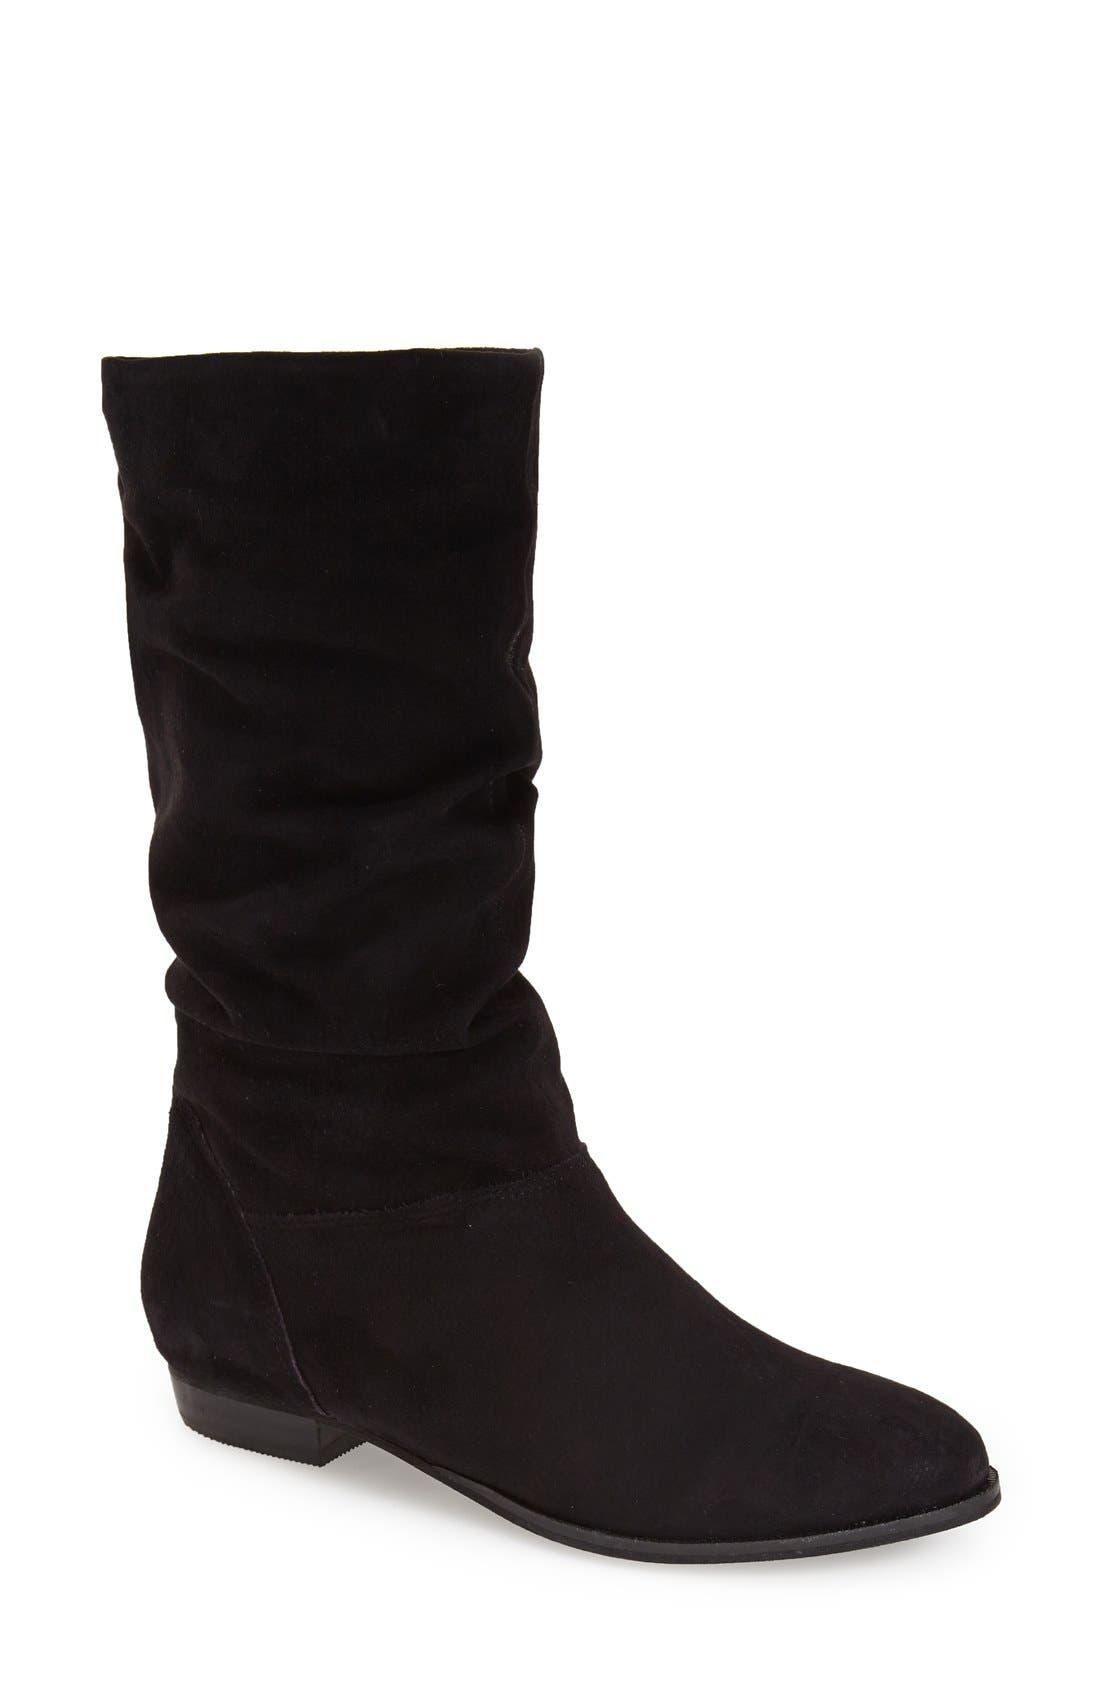 Main Image - Dune London'Relissa' Scrunch Boot(Women)